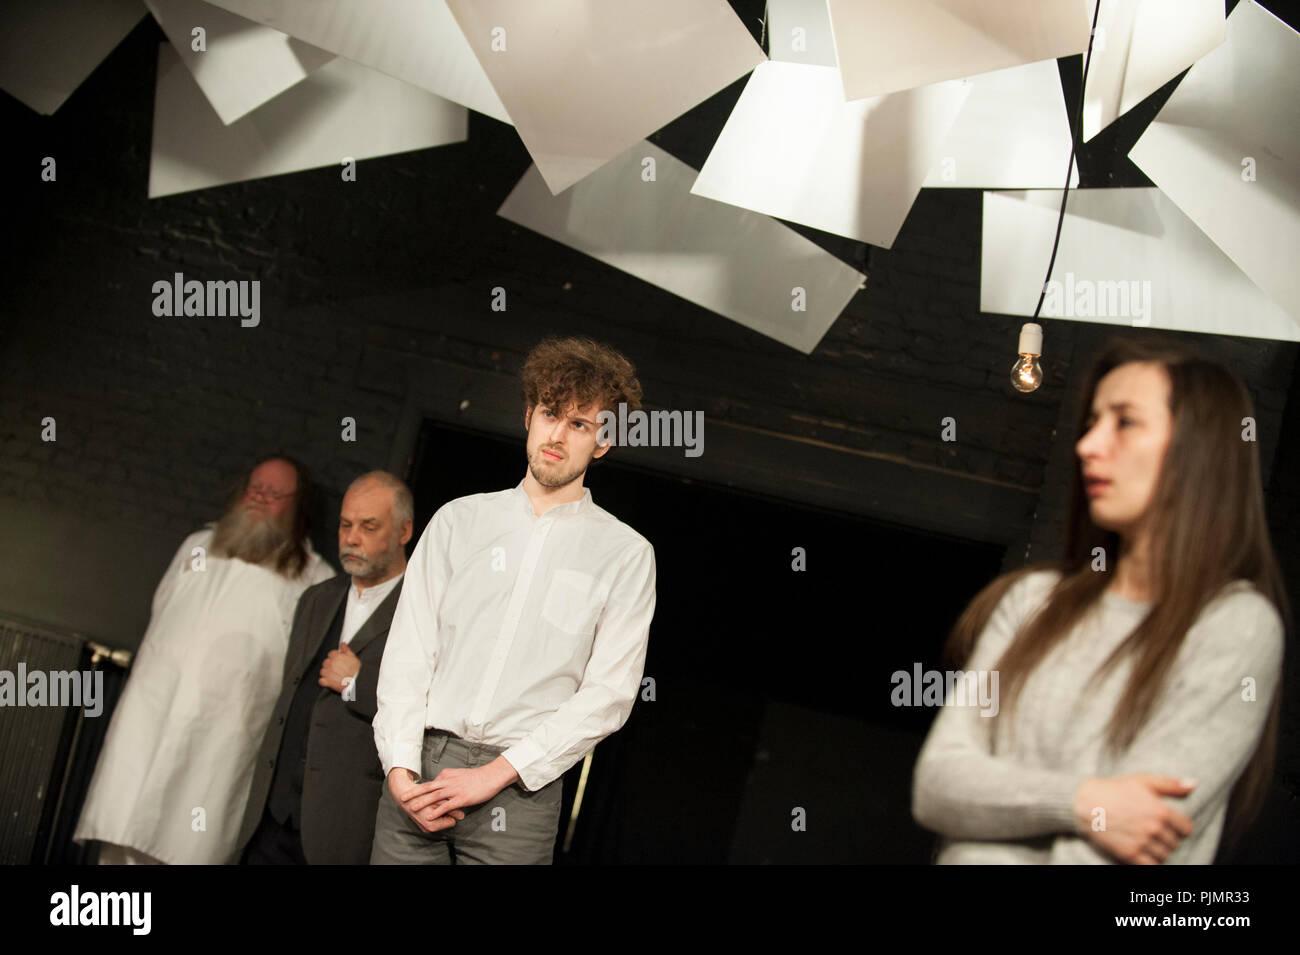 Theatre company De Reynaertghesellen playing Gute Leute, Nicht Brennen from Hilde Verboven, directed by Jan Schoolmeesters (Leuven, 02/03/2018) - Stock Image